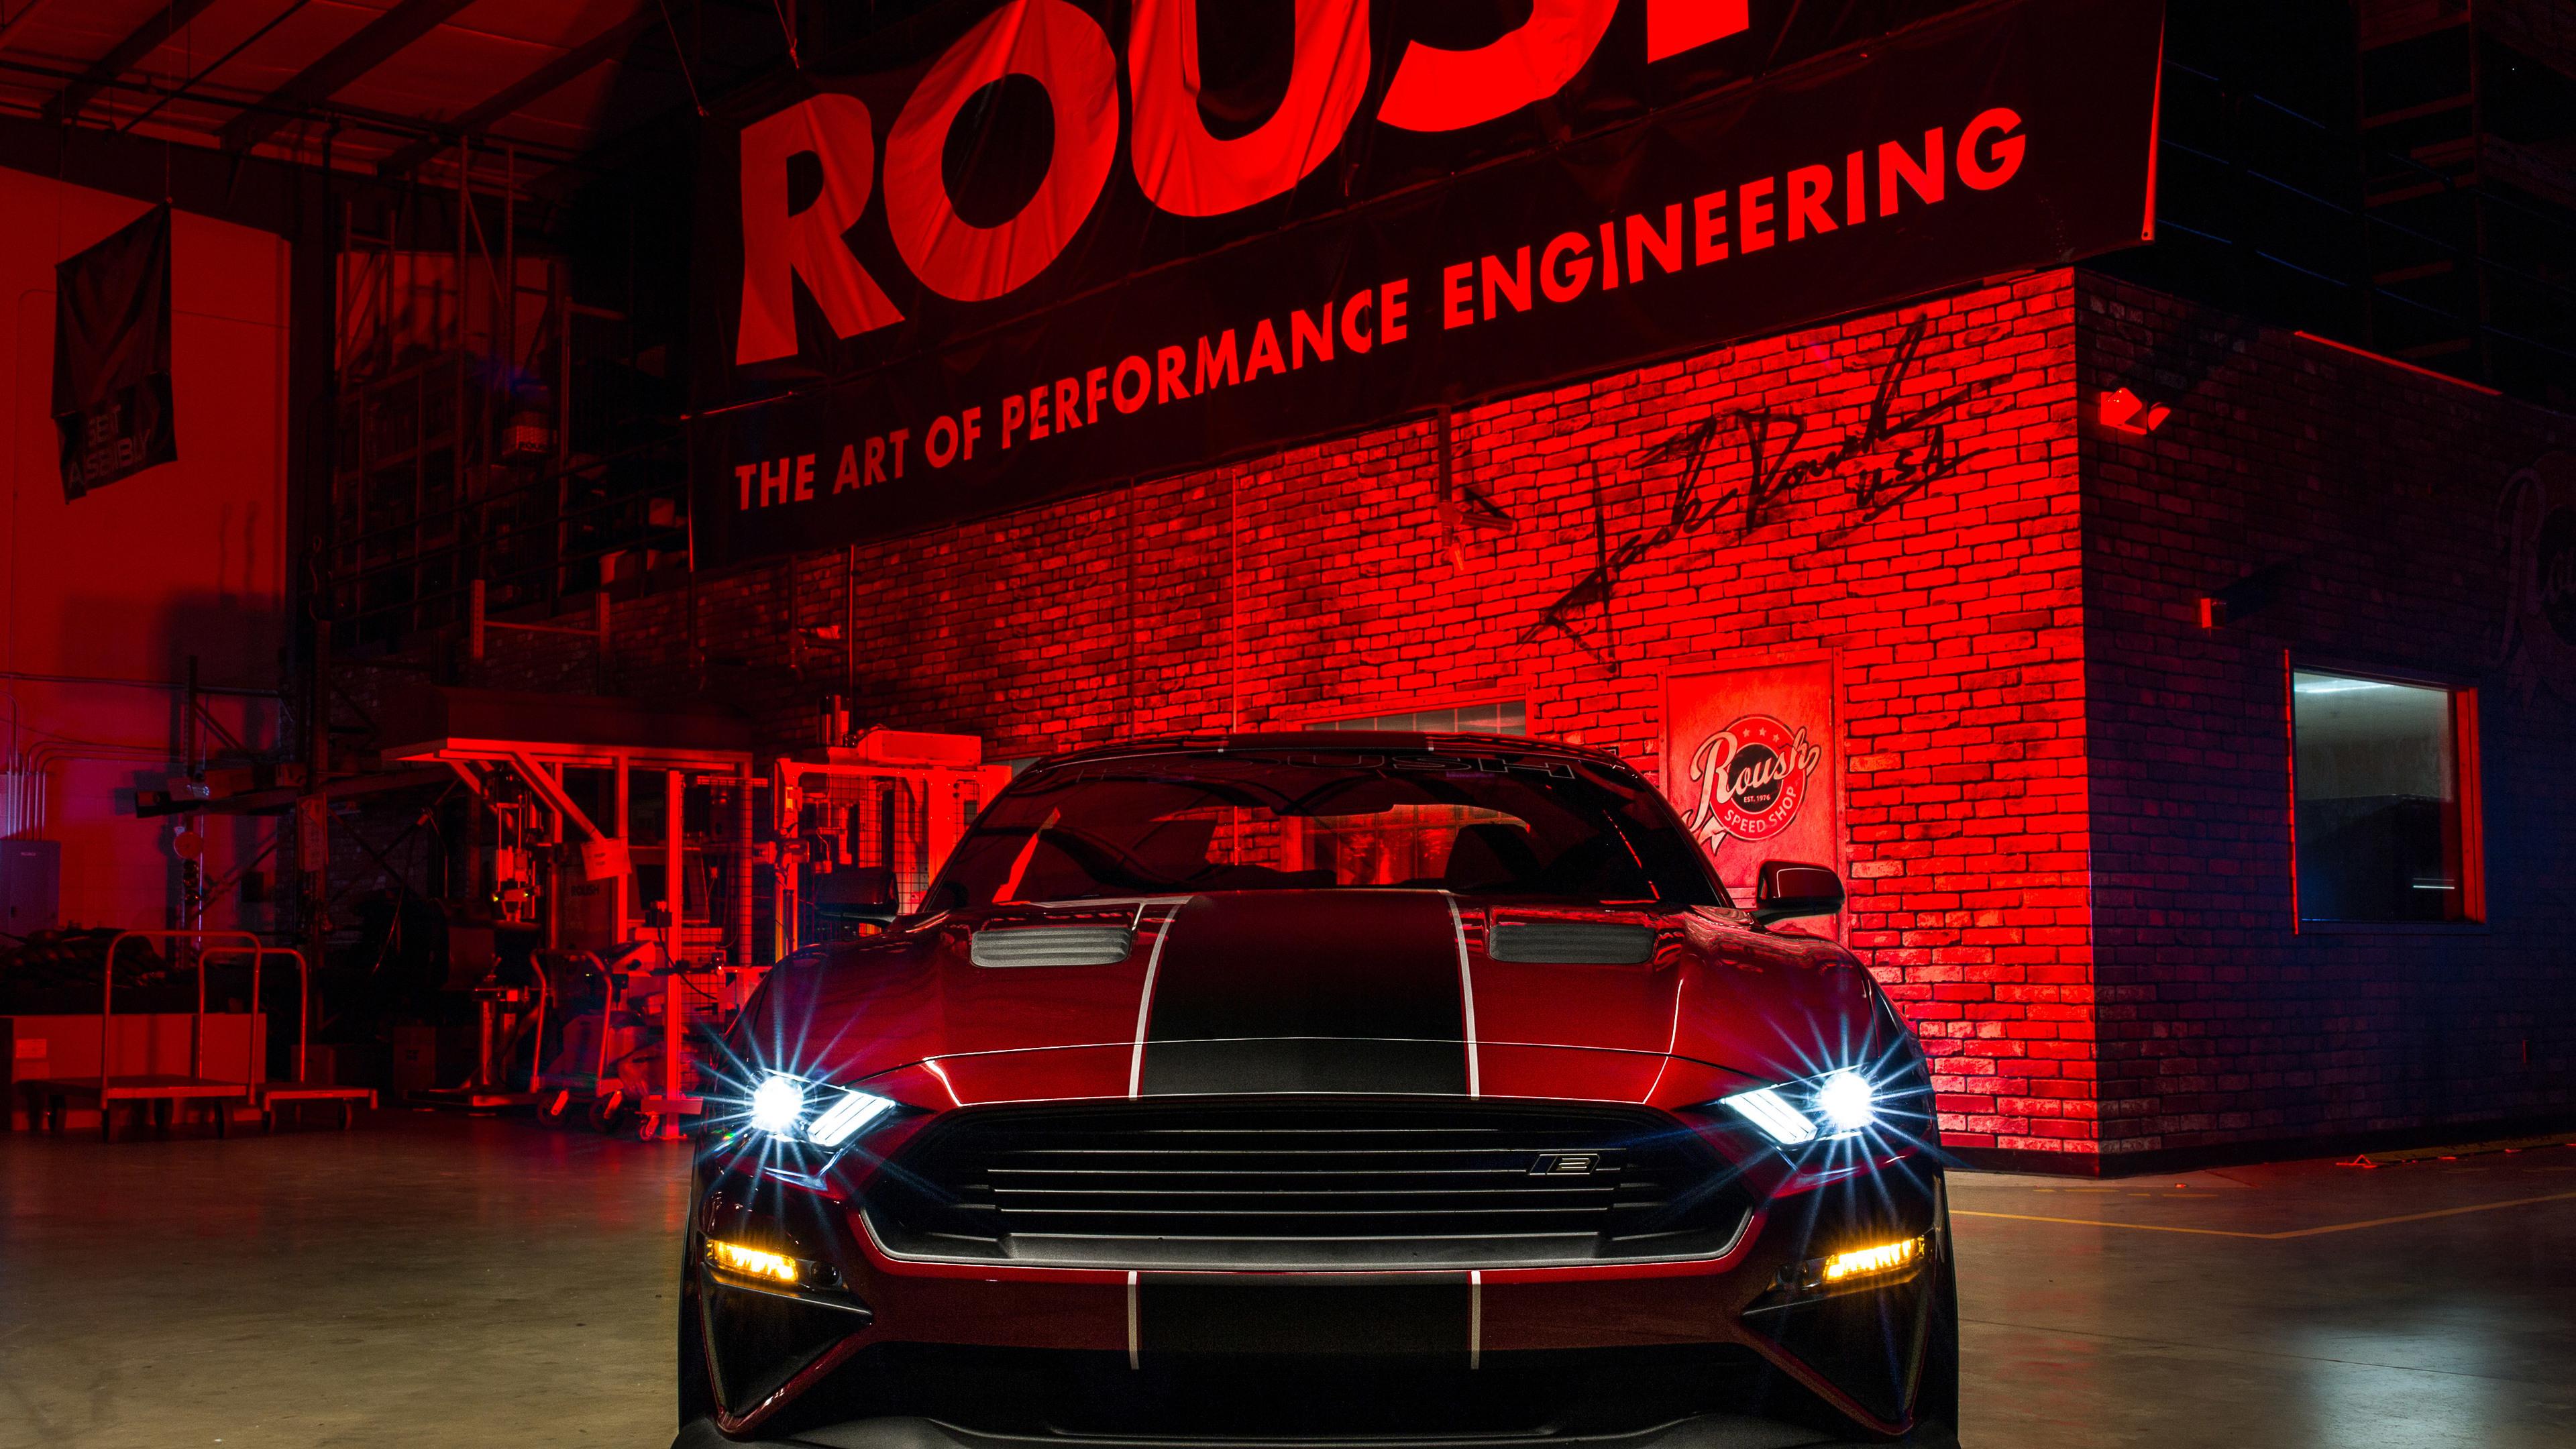 2018 roush rs2 1539110581 - 2018 Roush RS2 - roush rs2 wallpapers, mustang wallpapers, hd-wallpapers, cars wallpapers, 4k-wallpapers, 2018 cars wallpapers